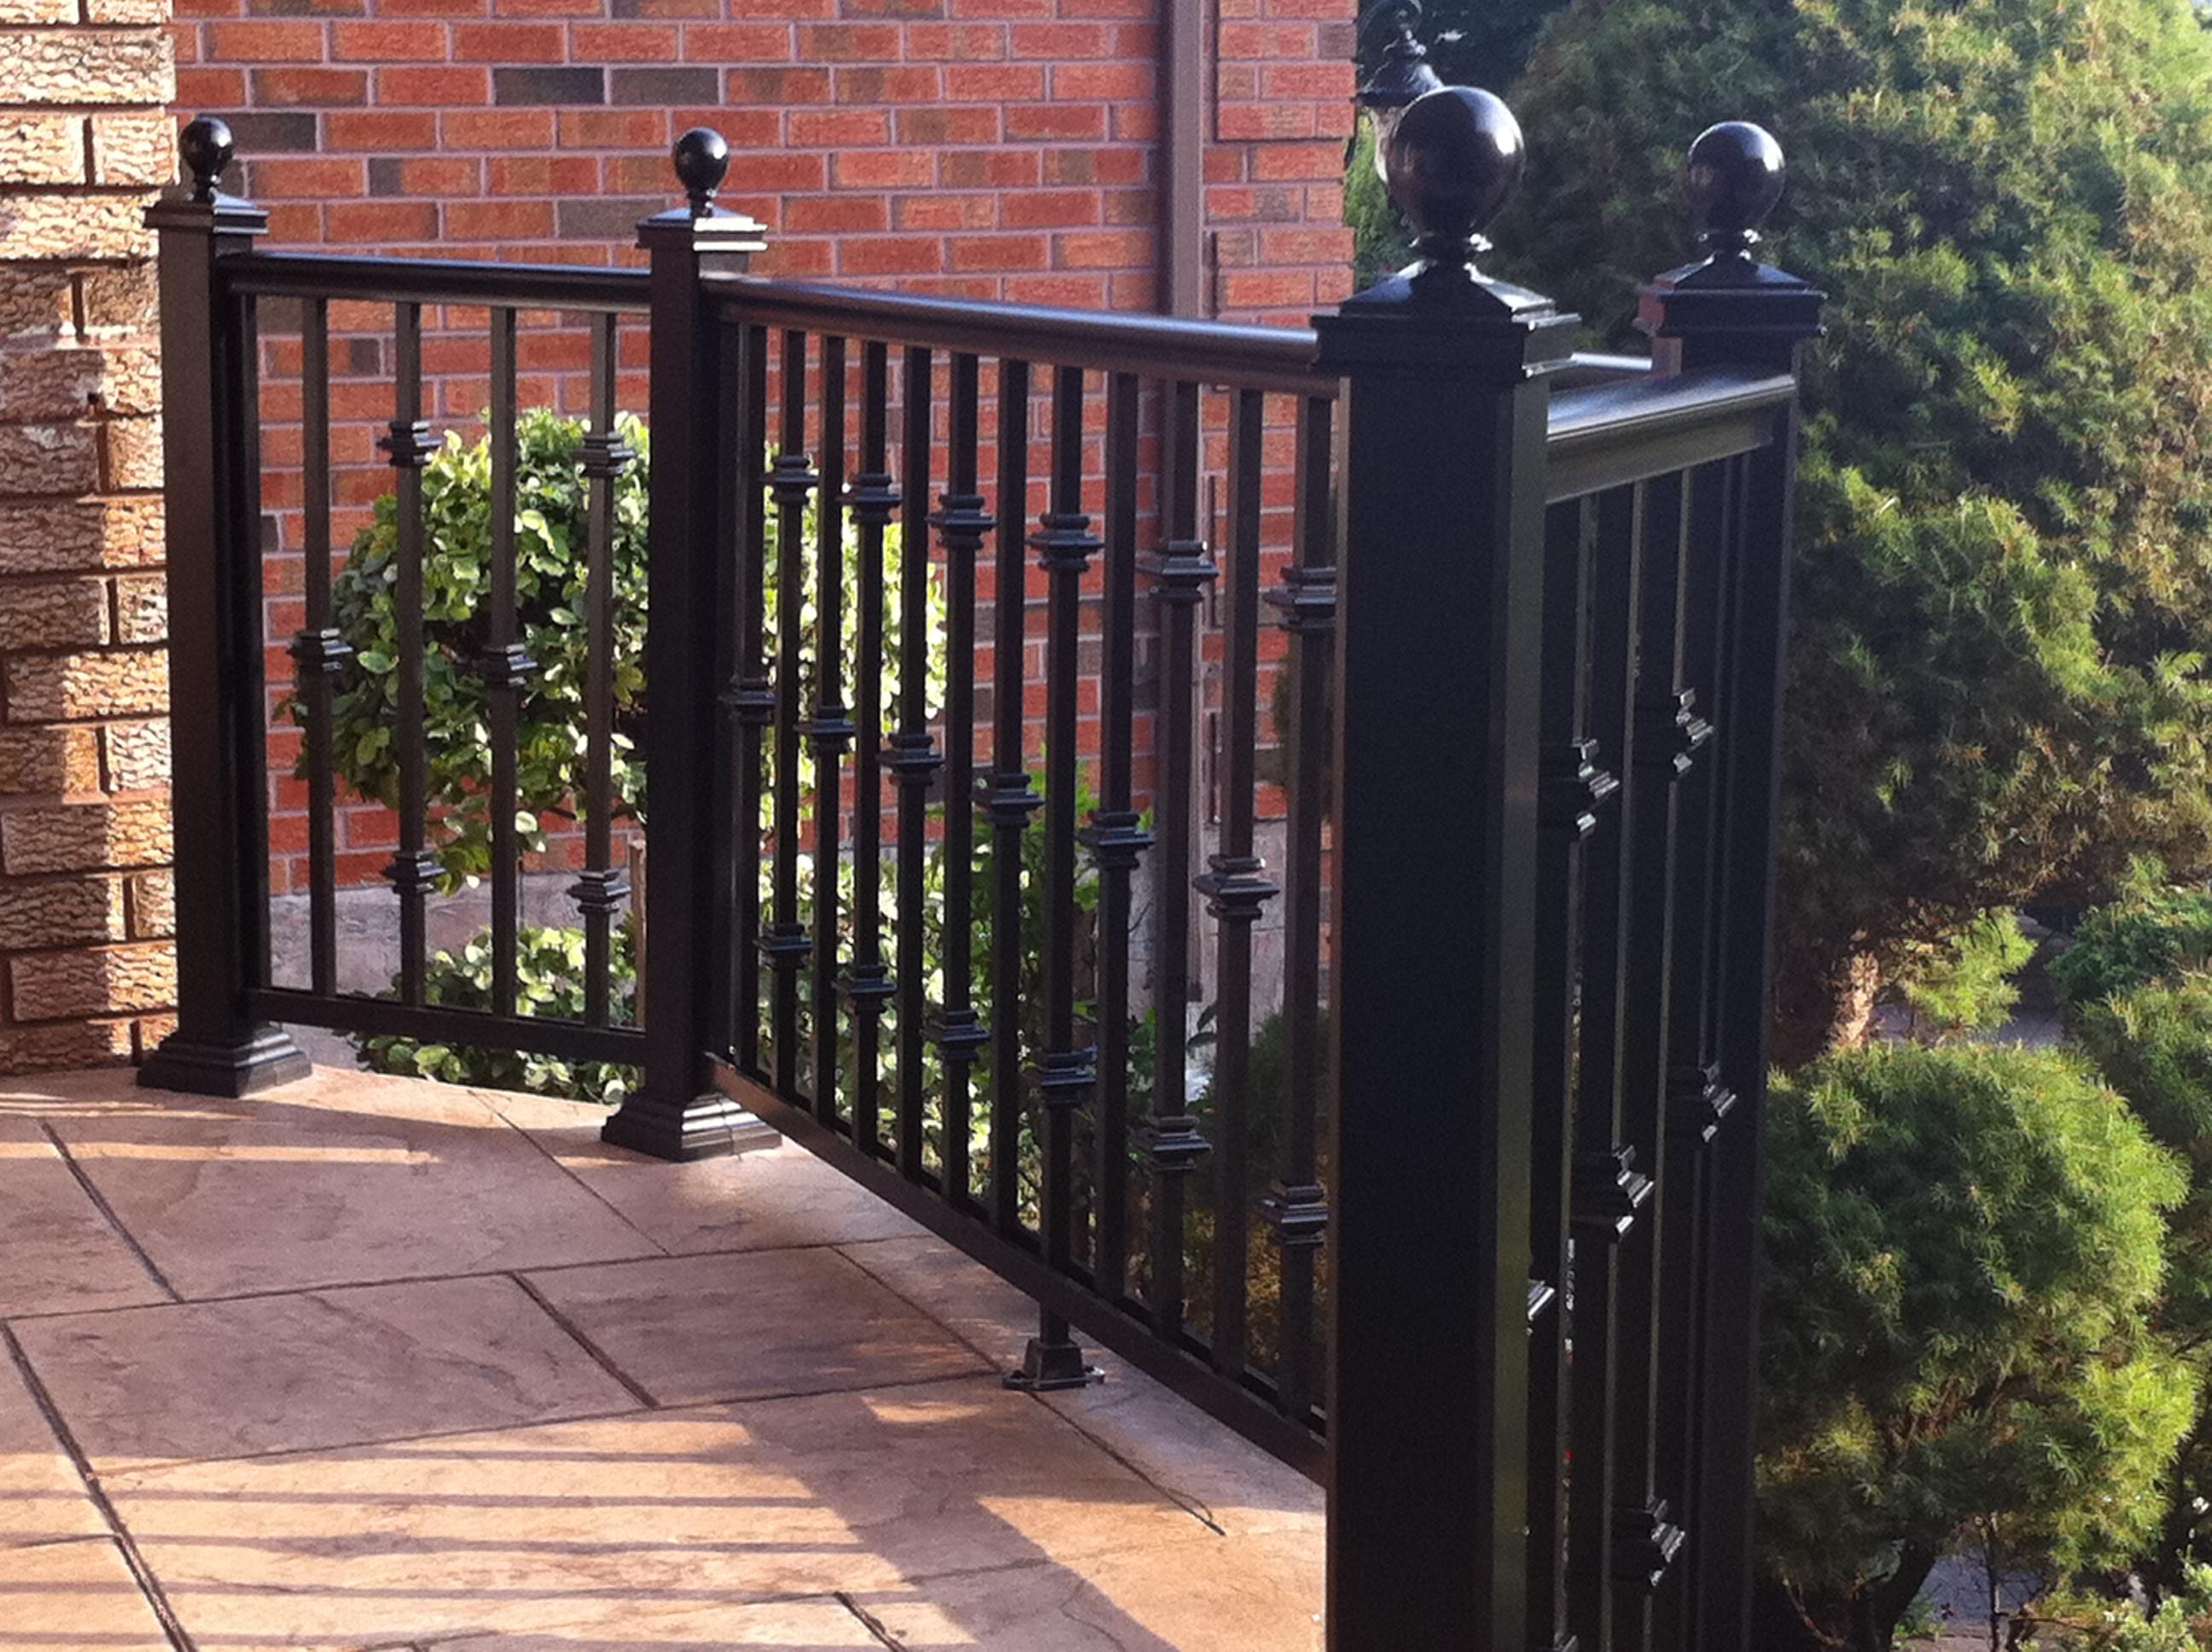 aluminum railing awning porch enclosure front doors toronto gta. Black Bedroom Furniture Sets. Home Design Ideas